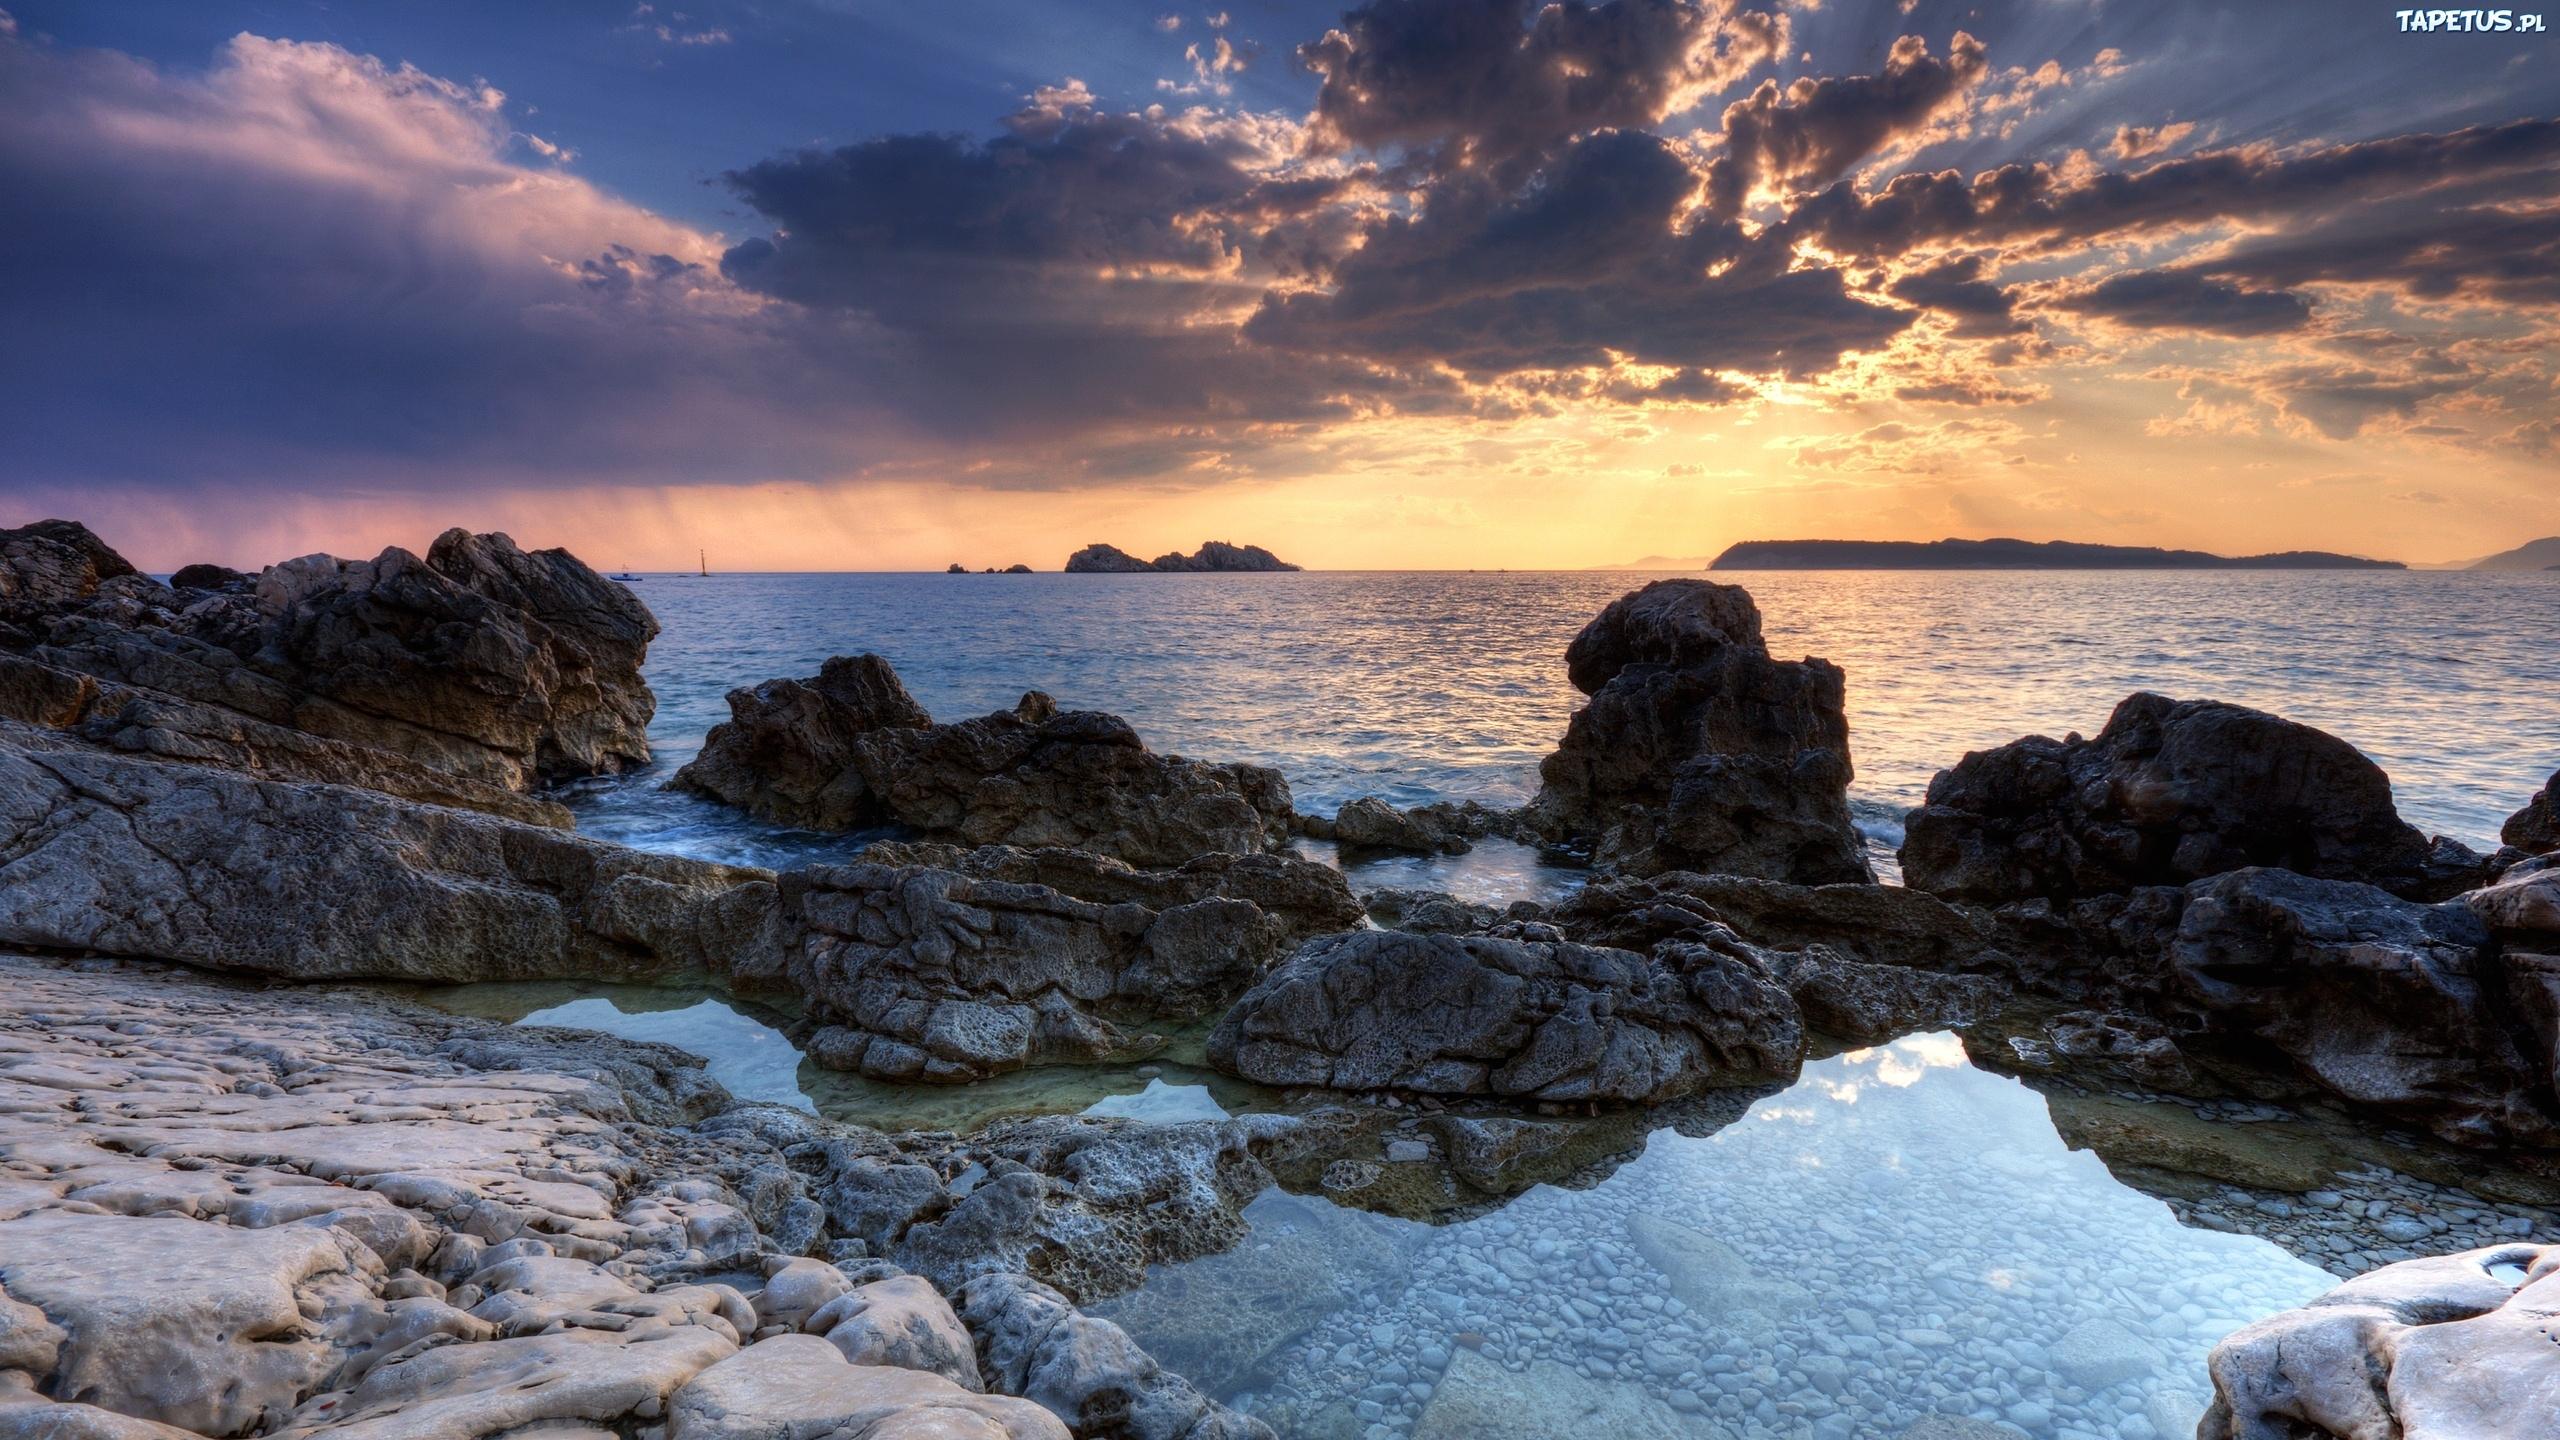 закат камень берег море sunset stone shore sea  № 1023765 бесплатно